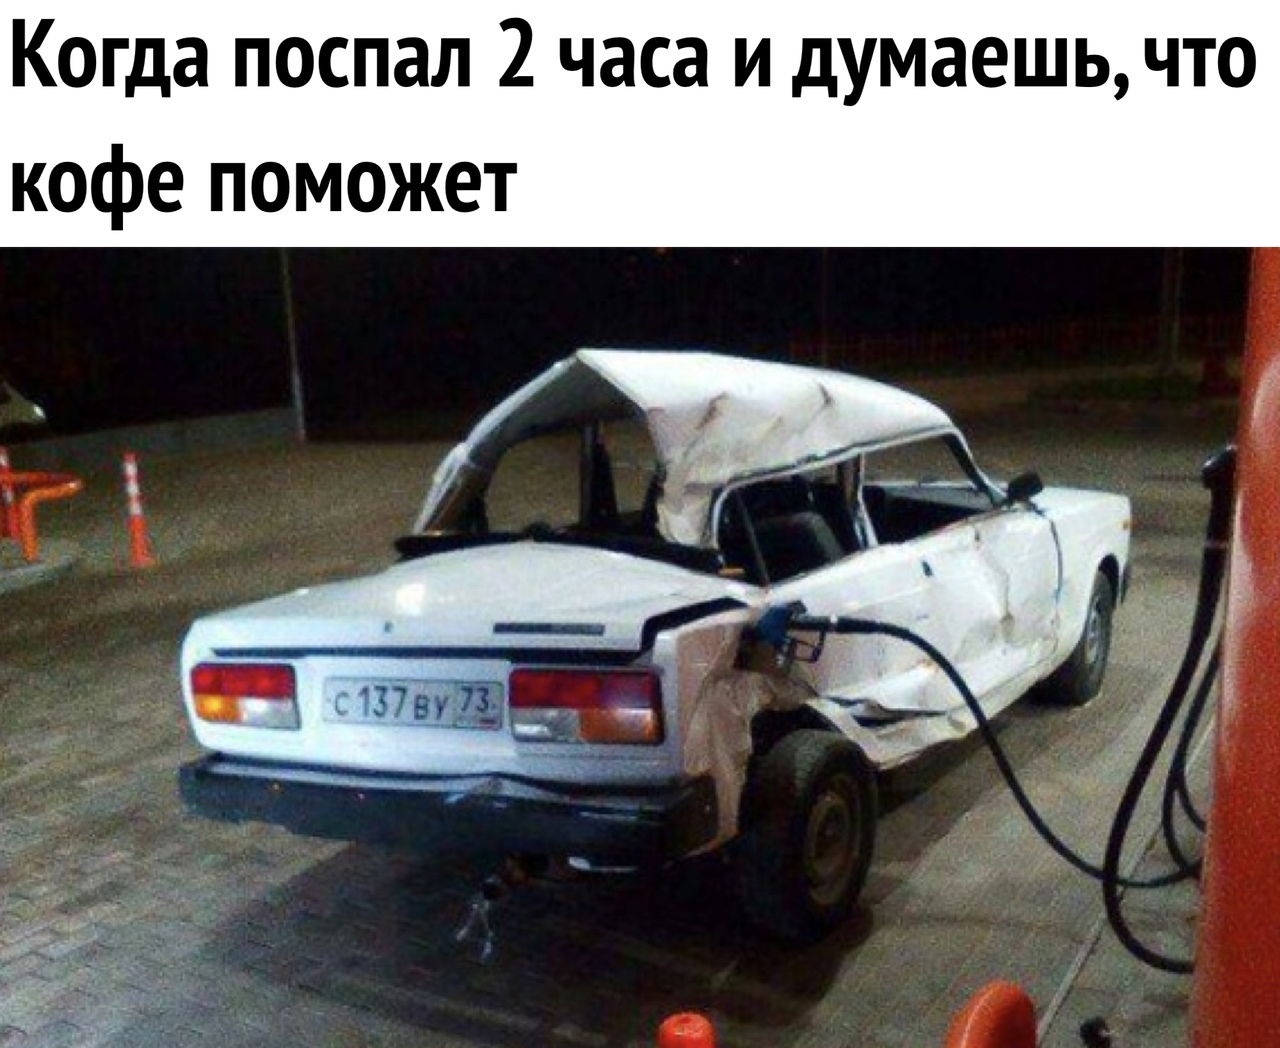 https://pp.userapi.com/c850620/v850620747/20d8b/WrnAOlrvcdA.jpg